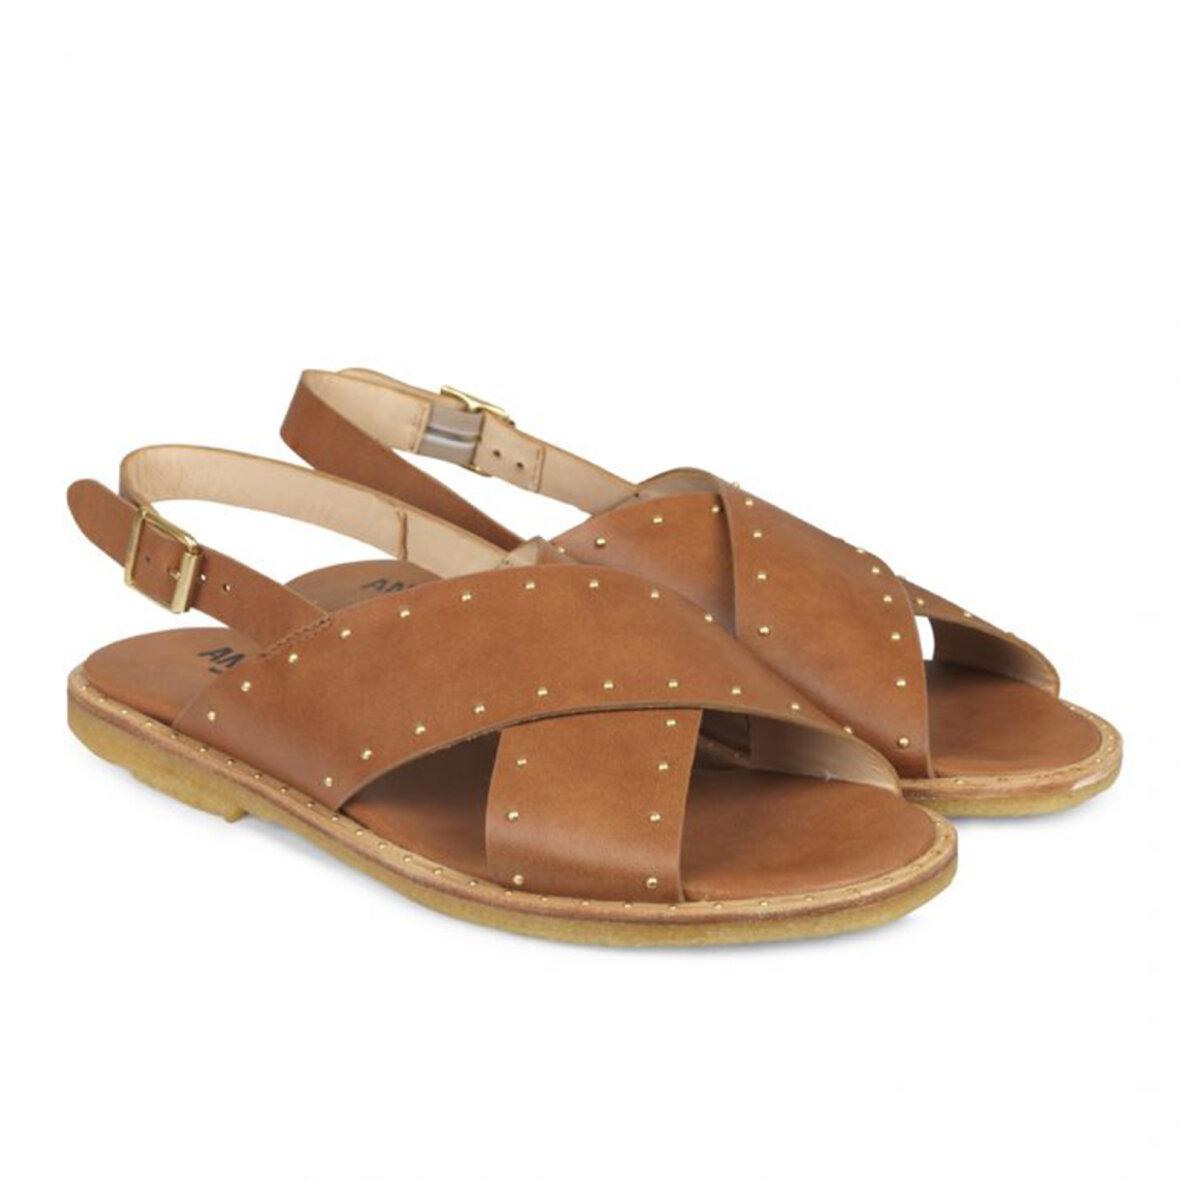 a0c274b7bfd0 ... Angulus - Angulus 5595 brun dame sandal med nitter ...